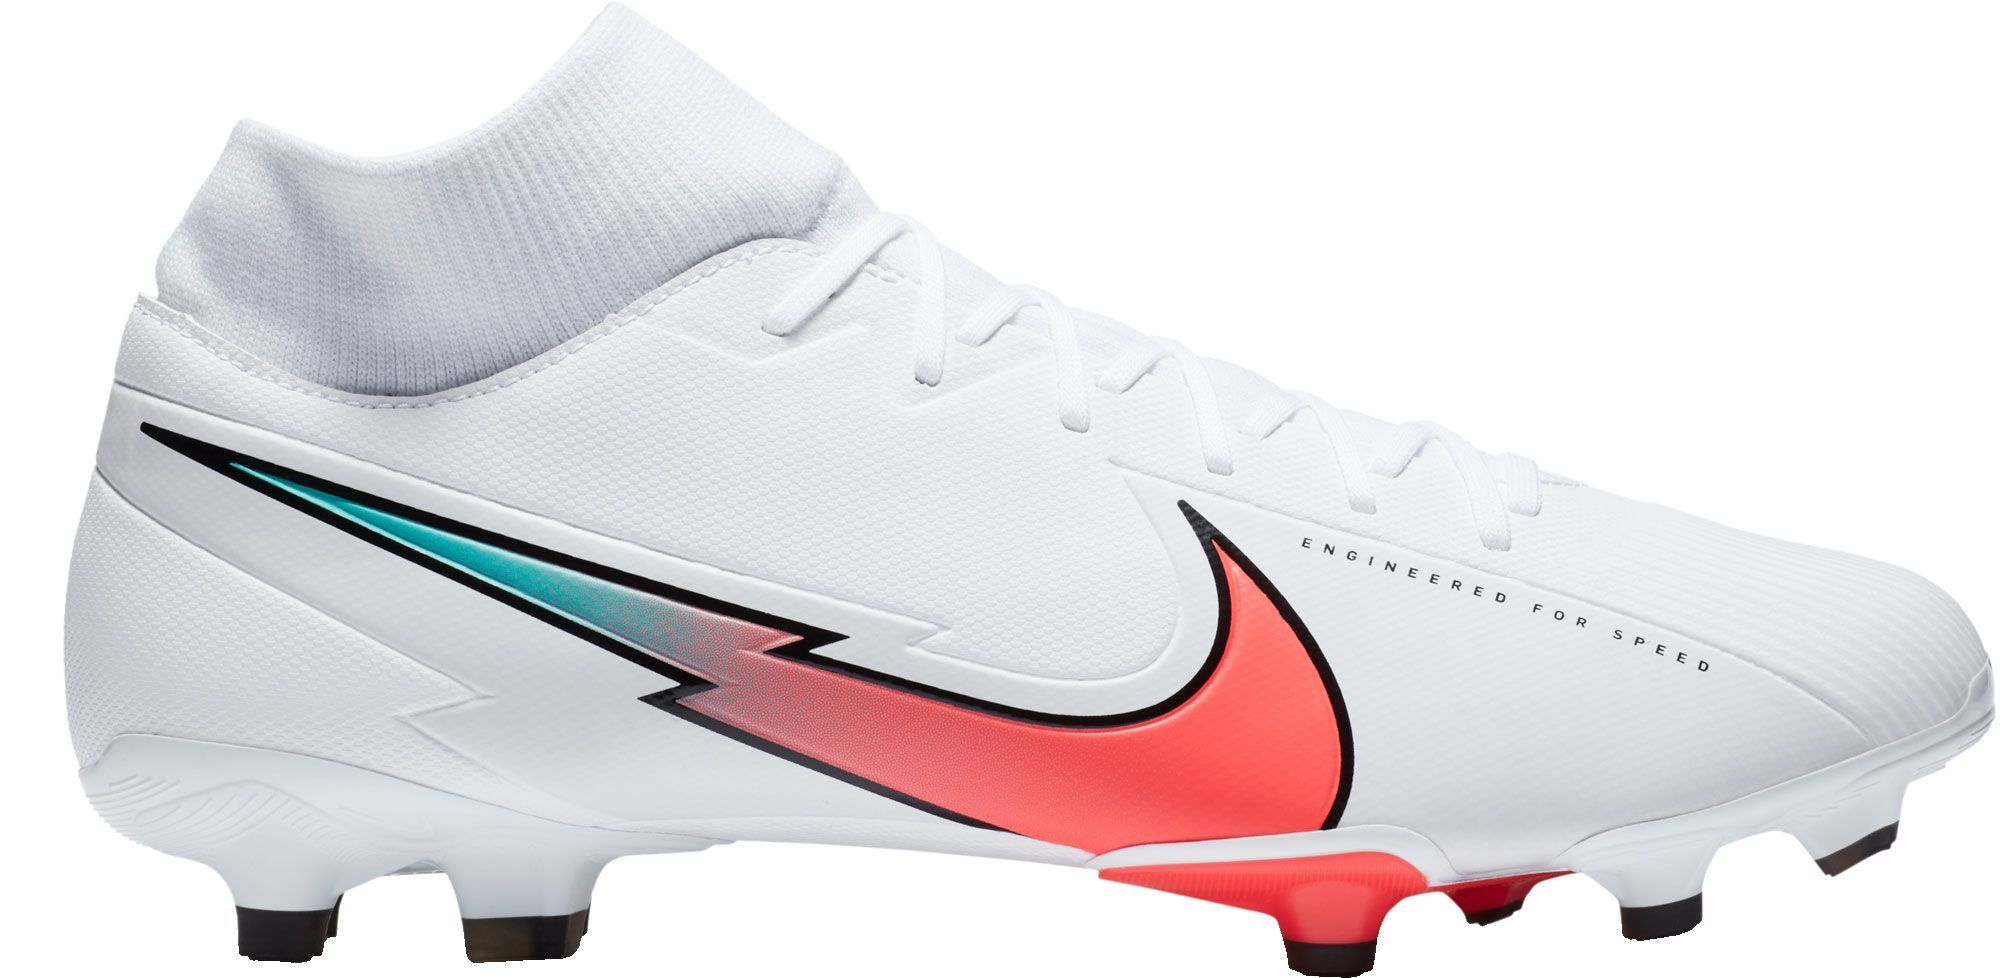 Nike Mercurial Superfly 7 Academy Fg Soccer Cleats In 2020 Soccer Cleats Nike Girls Womens Soccer Cleats Soccer Cleats